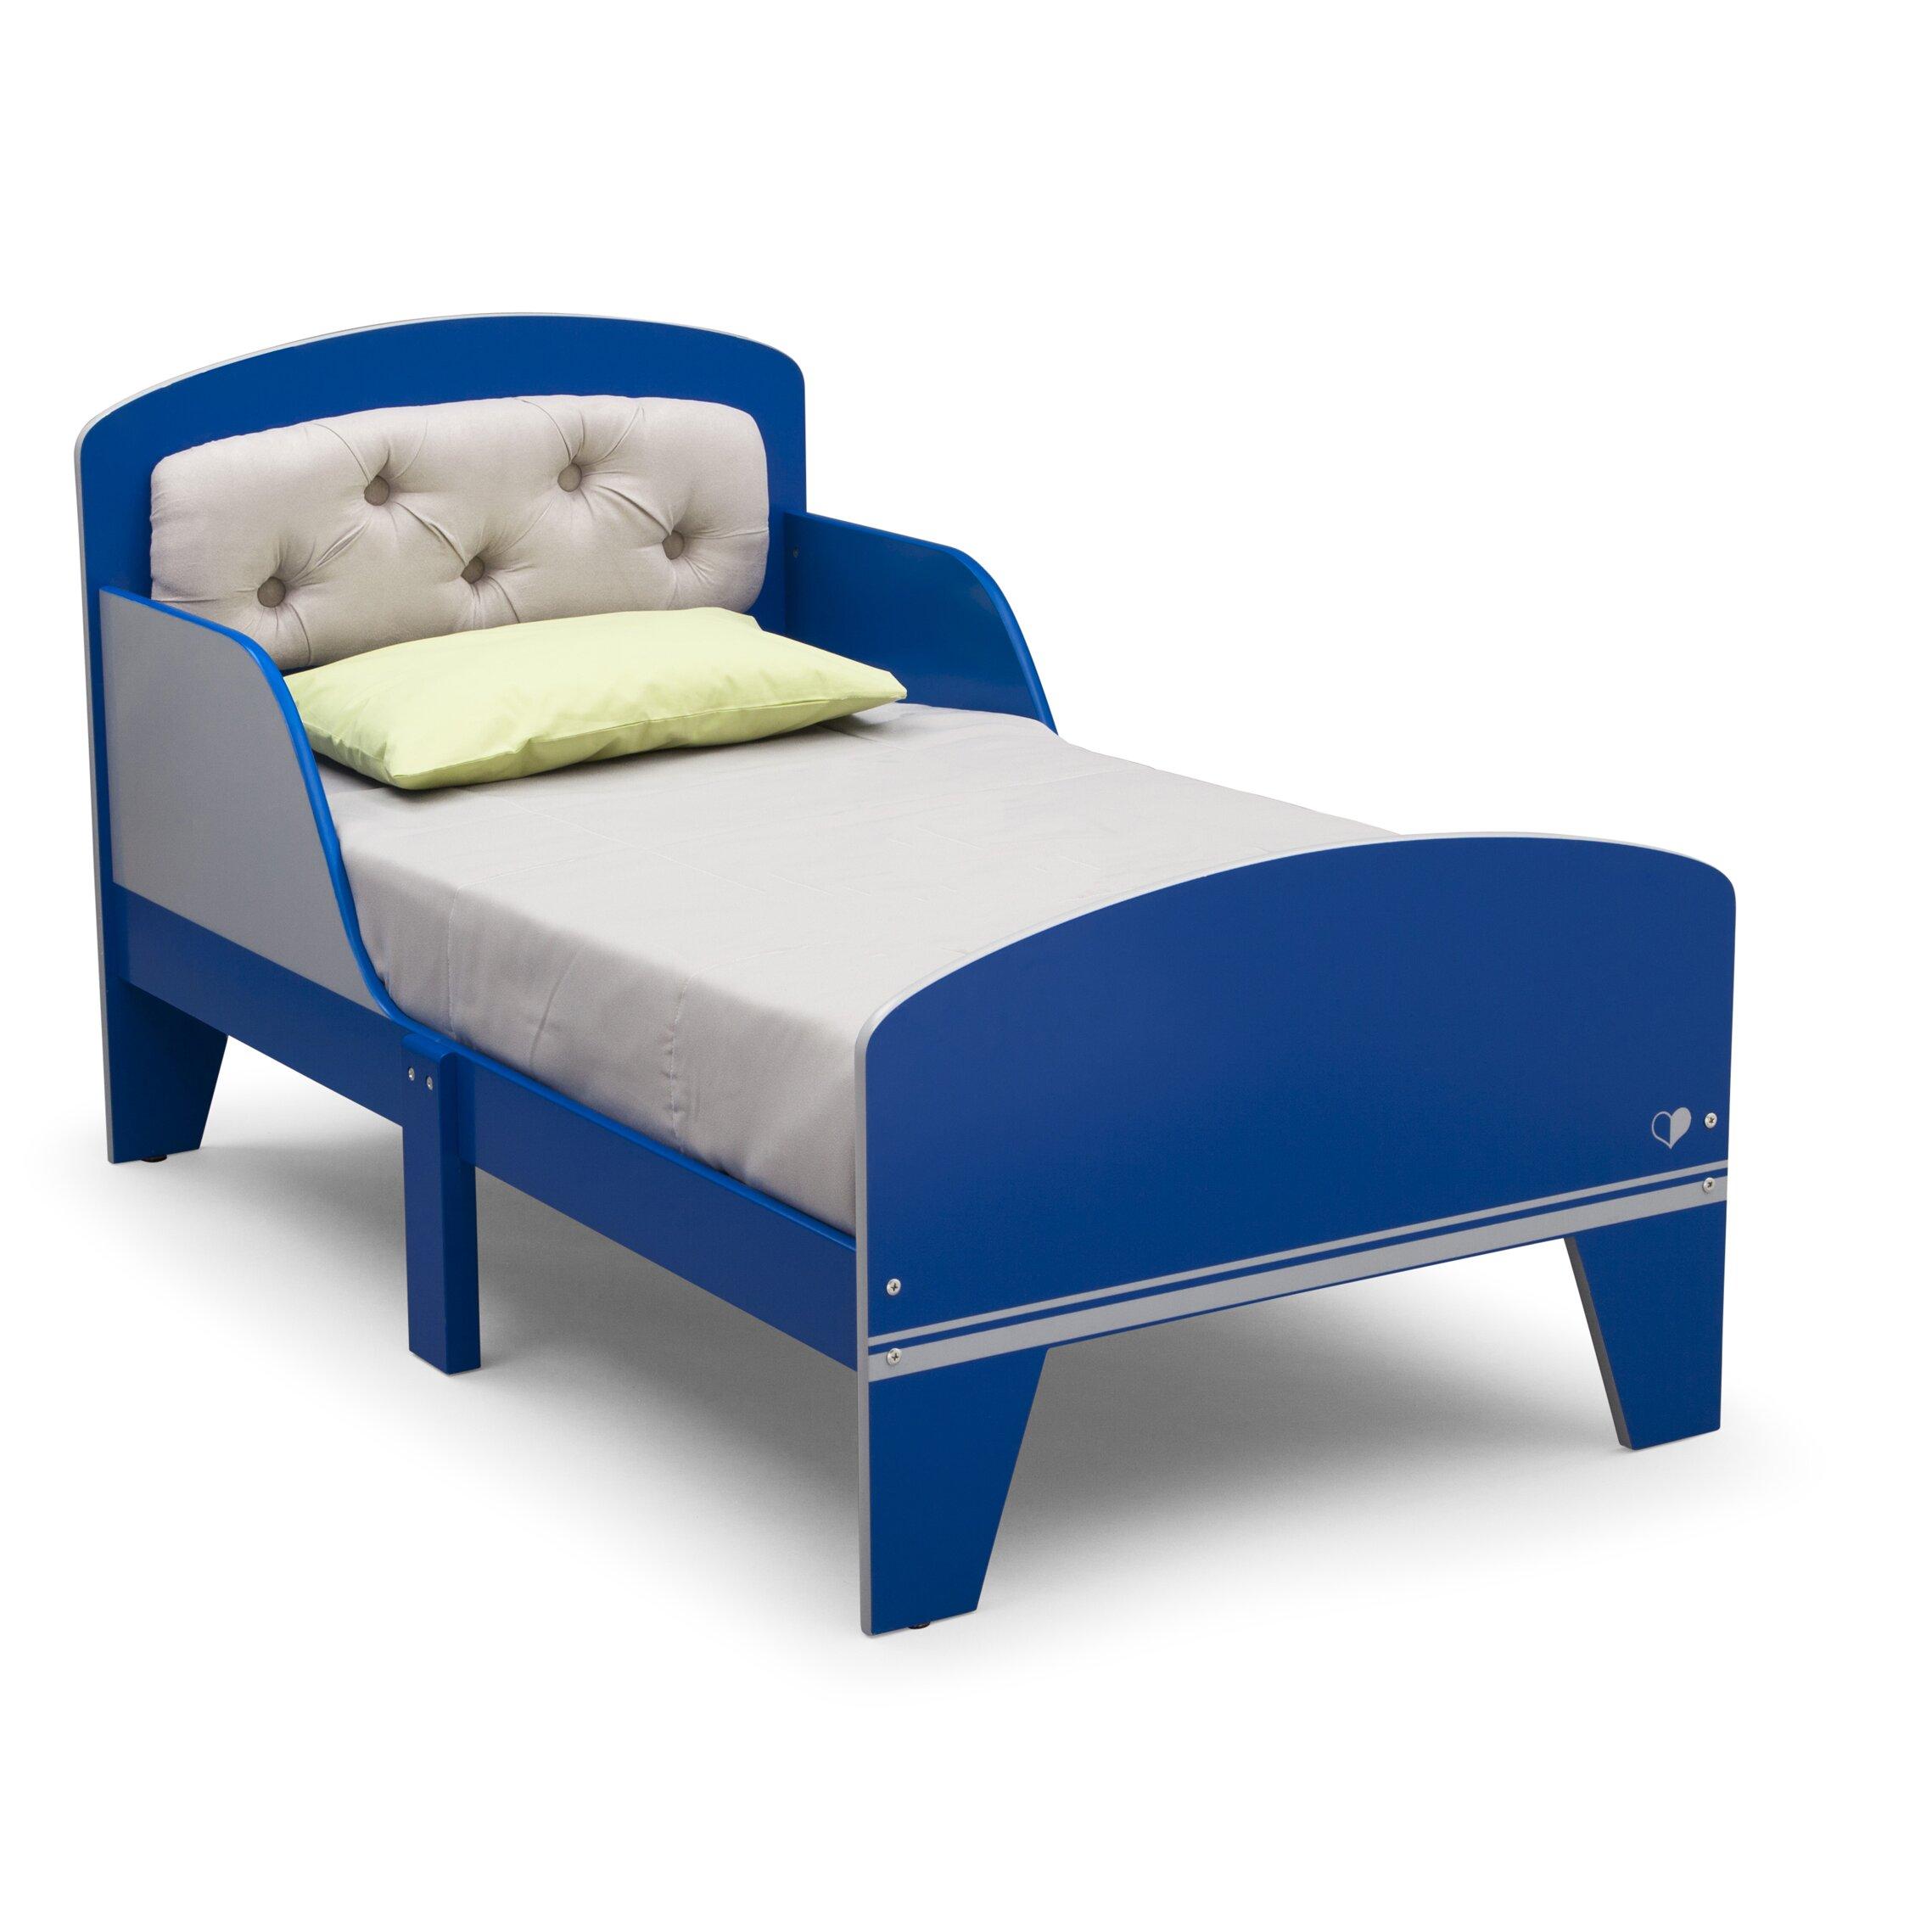 delta children jack and jill toddler bed with storage reviews wayfair. Black Bedroom Furniture Sets. Home Design Ideas